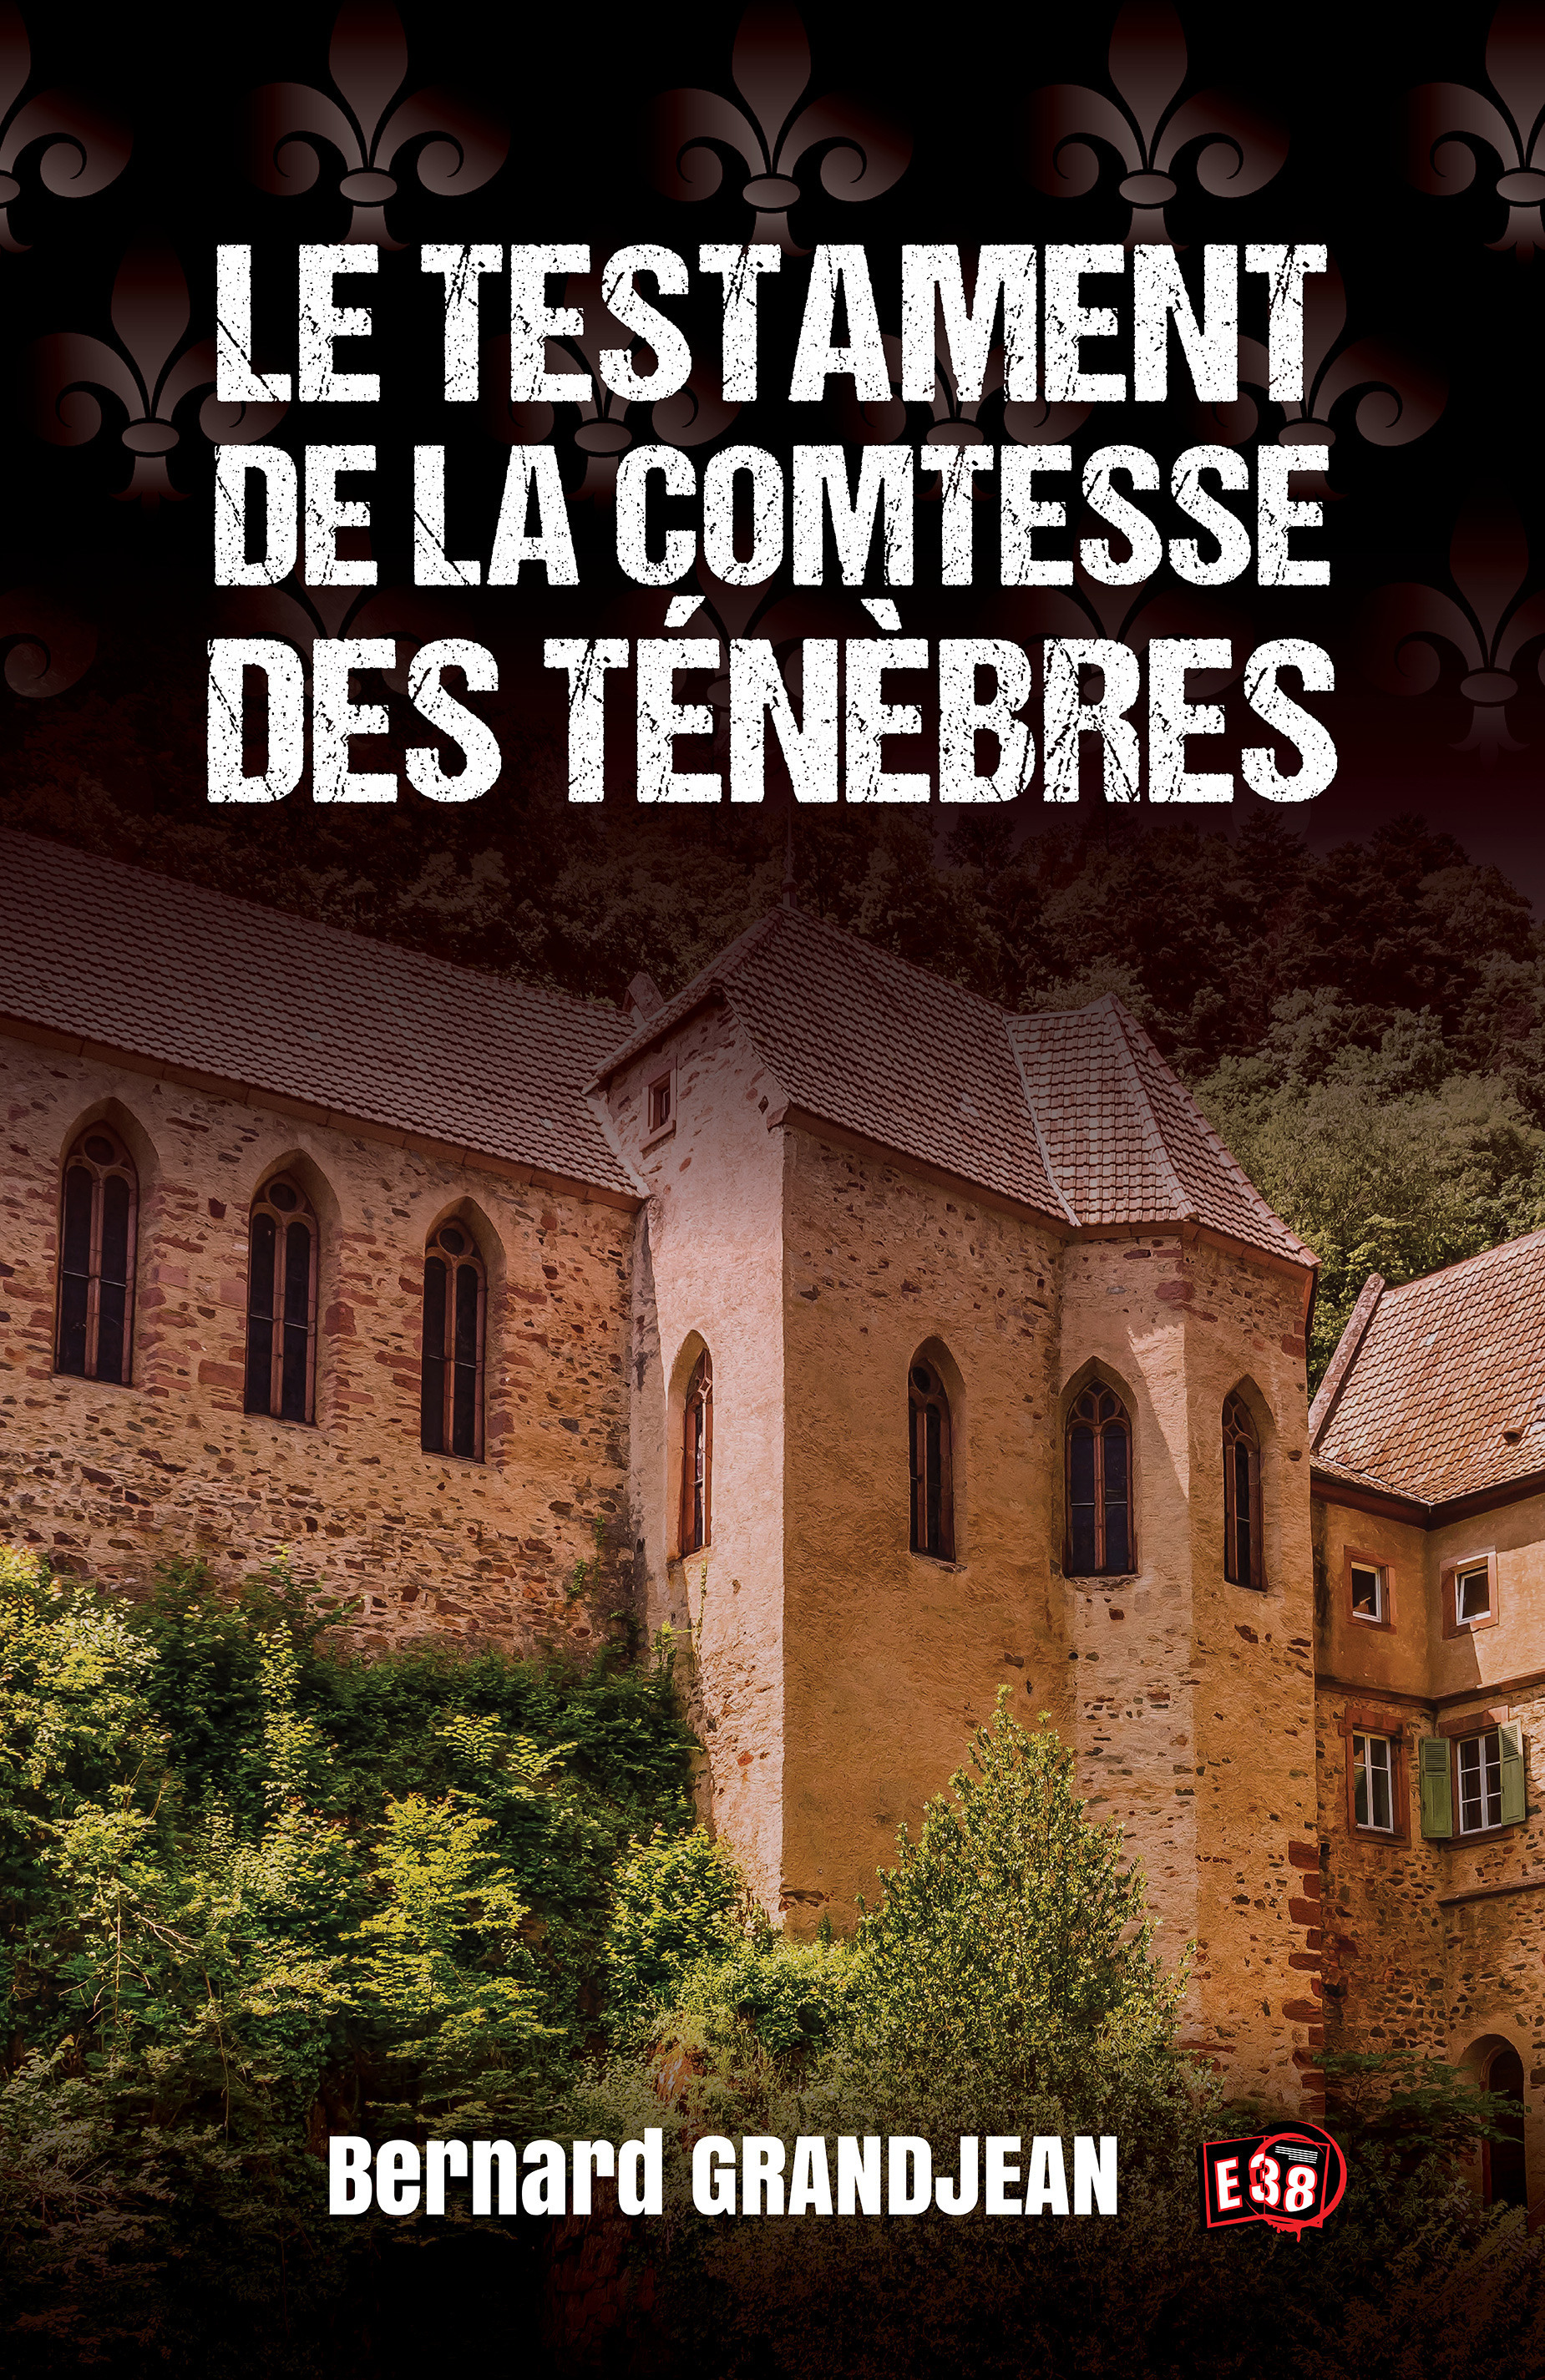 Le testament de la comtesse des tenebres